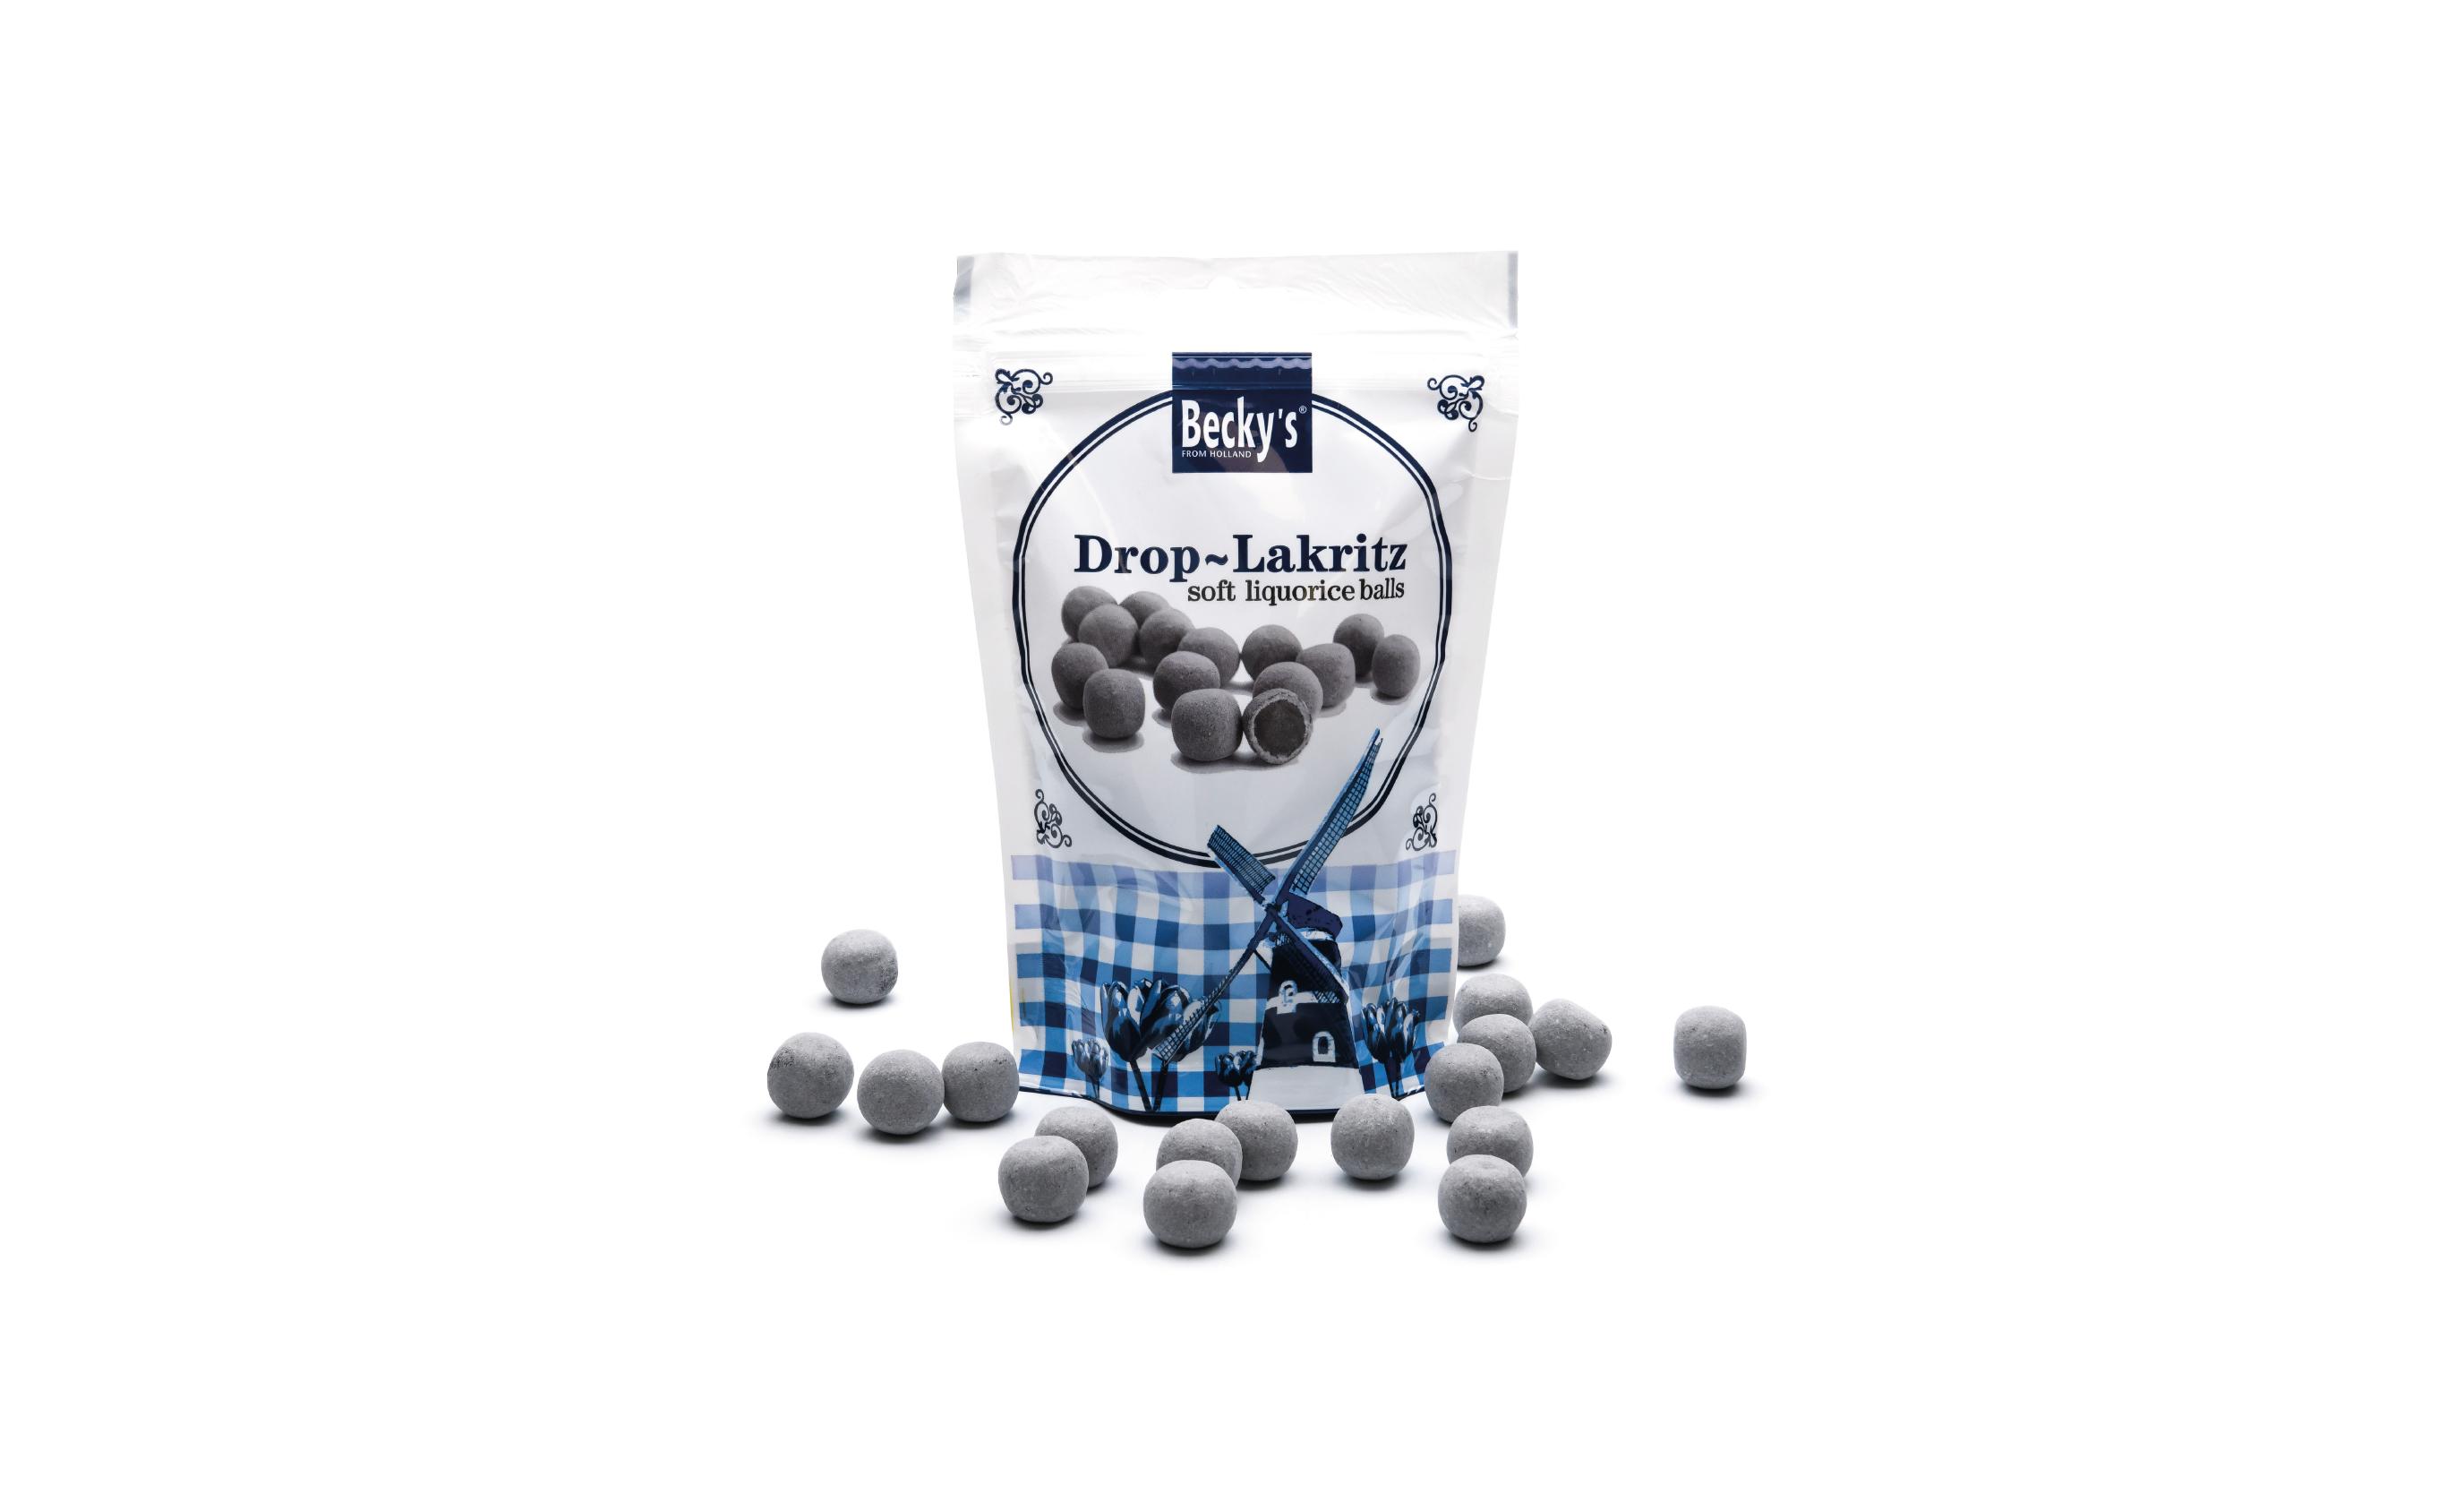 Soft liquorice balls